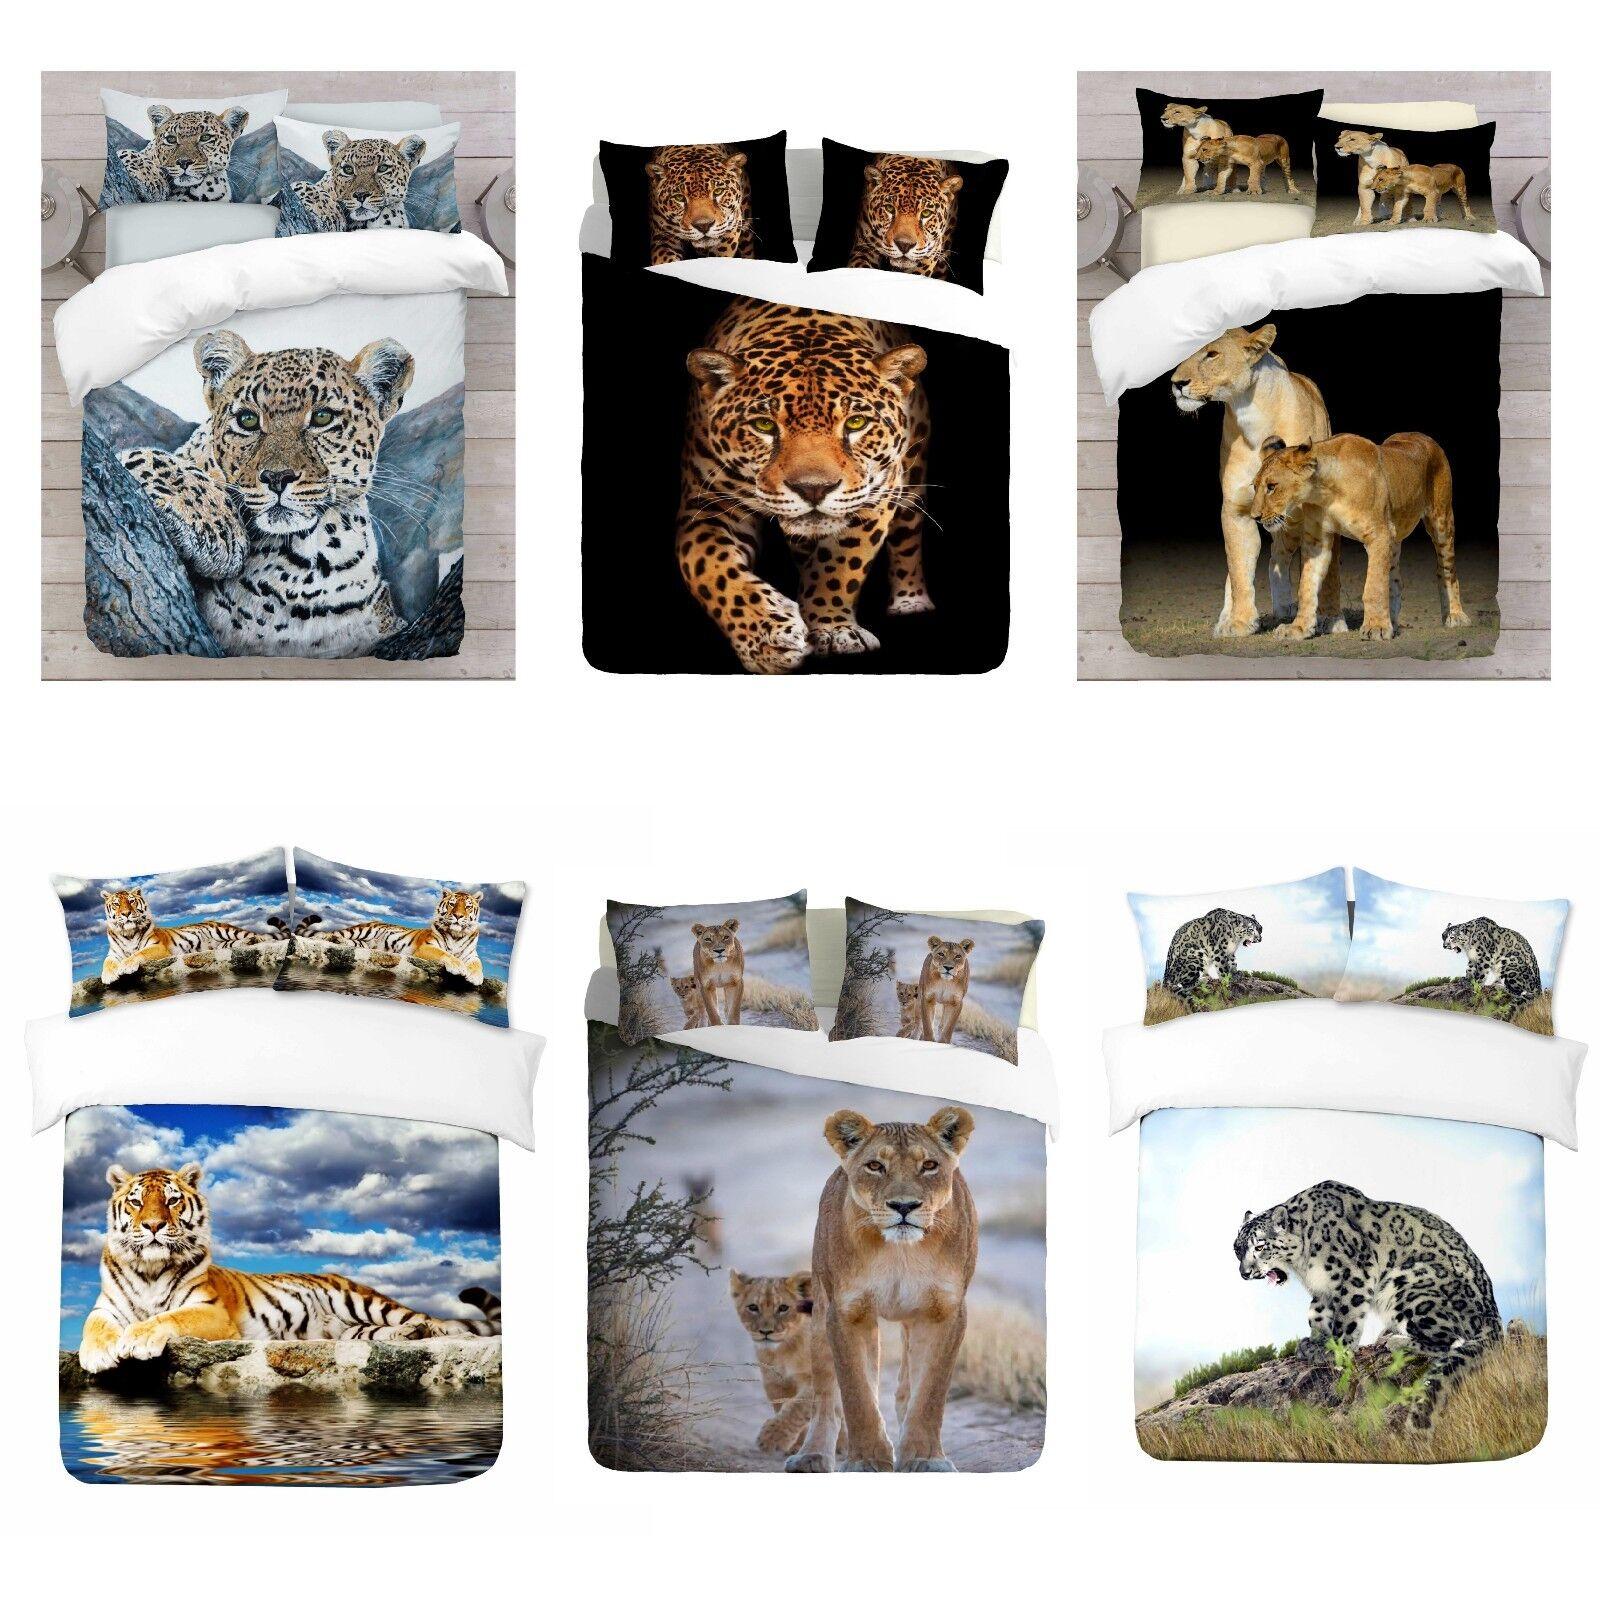 UK Made 3D Lions Design Photo Digital Duvet Quilt Startseite With Pillowcases